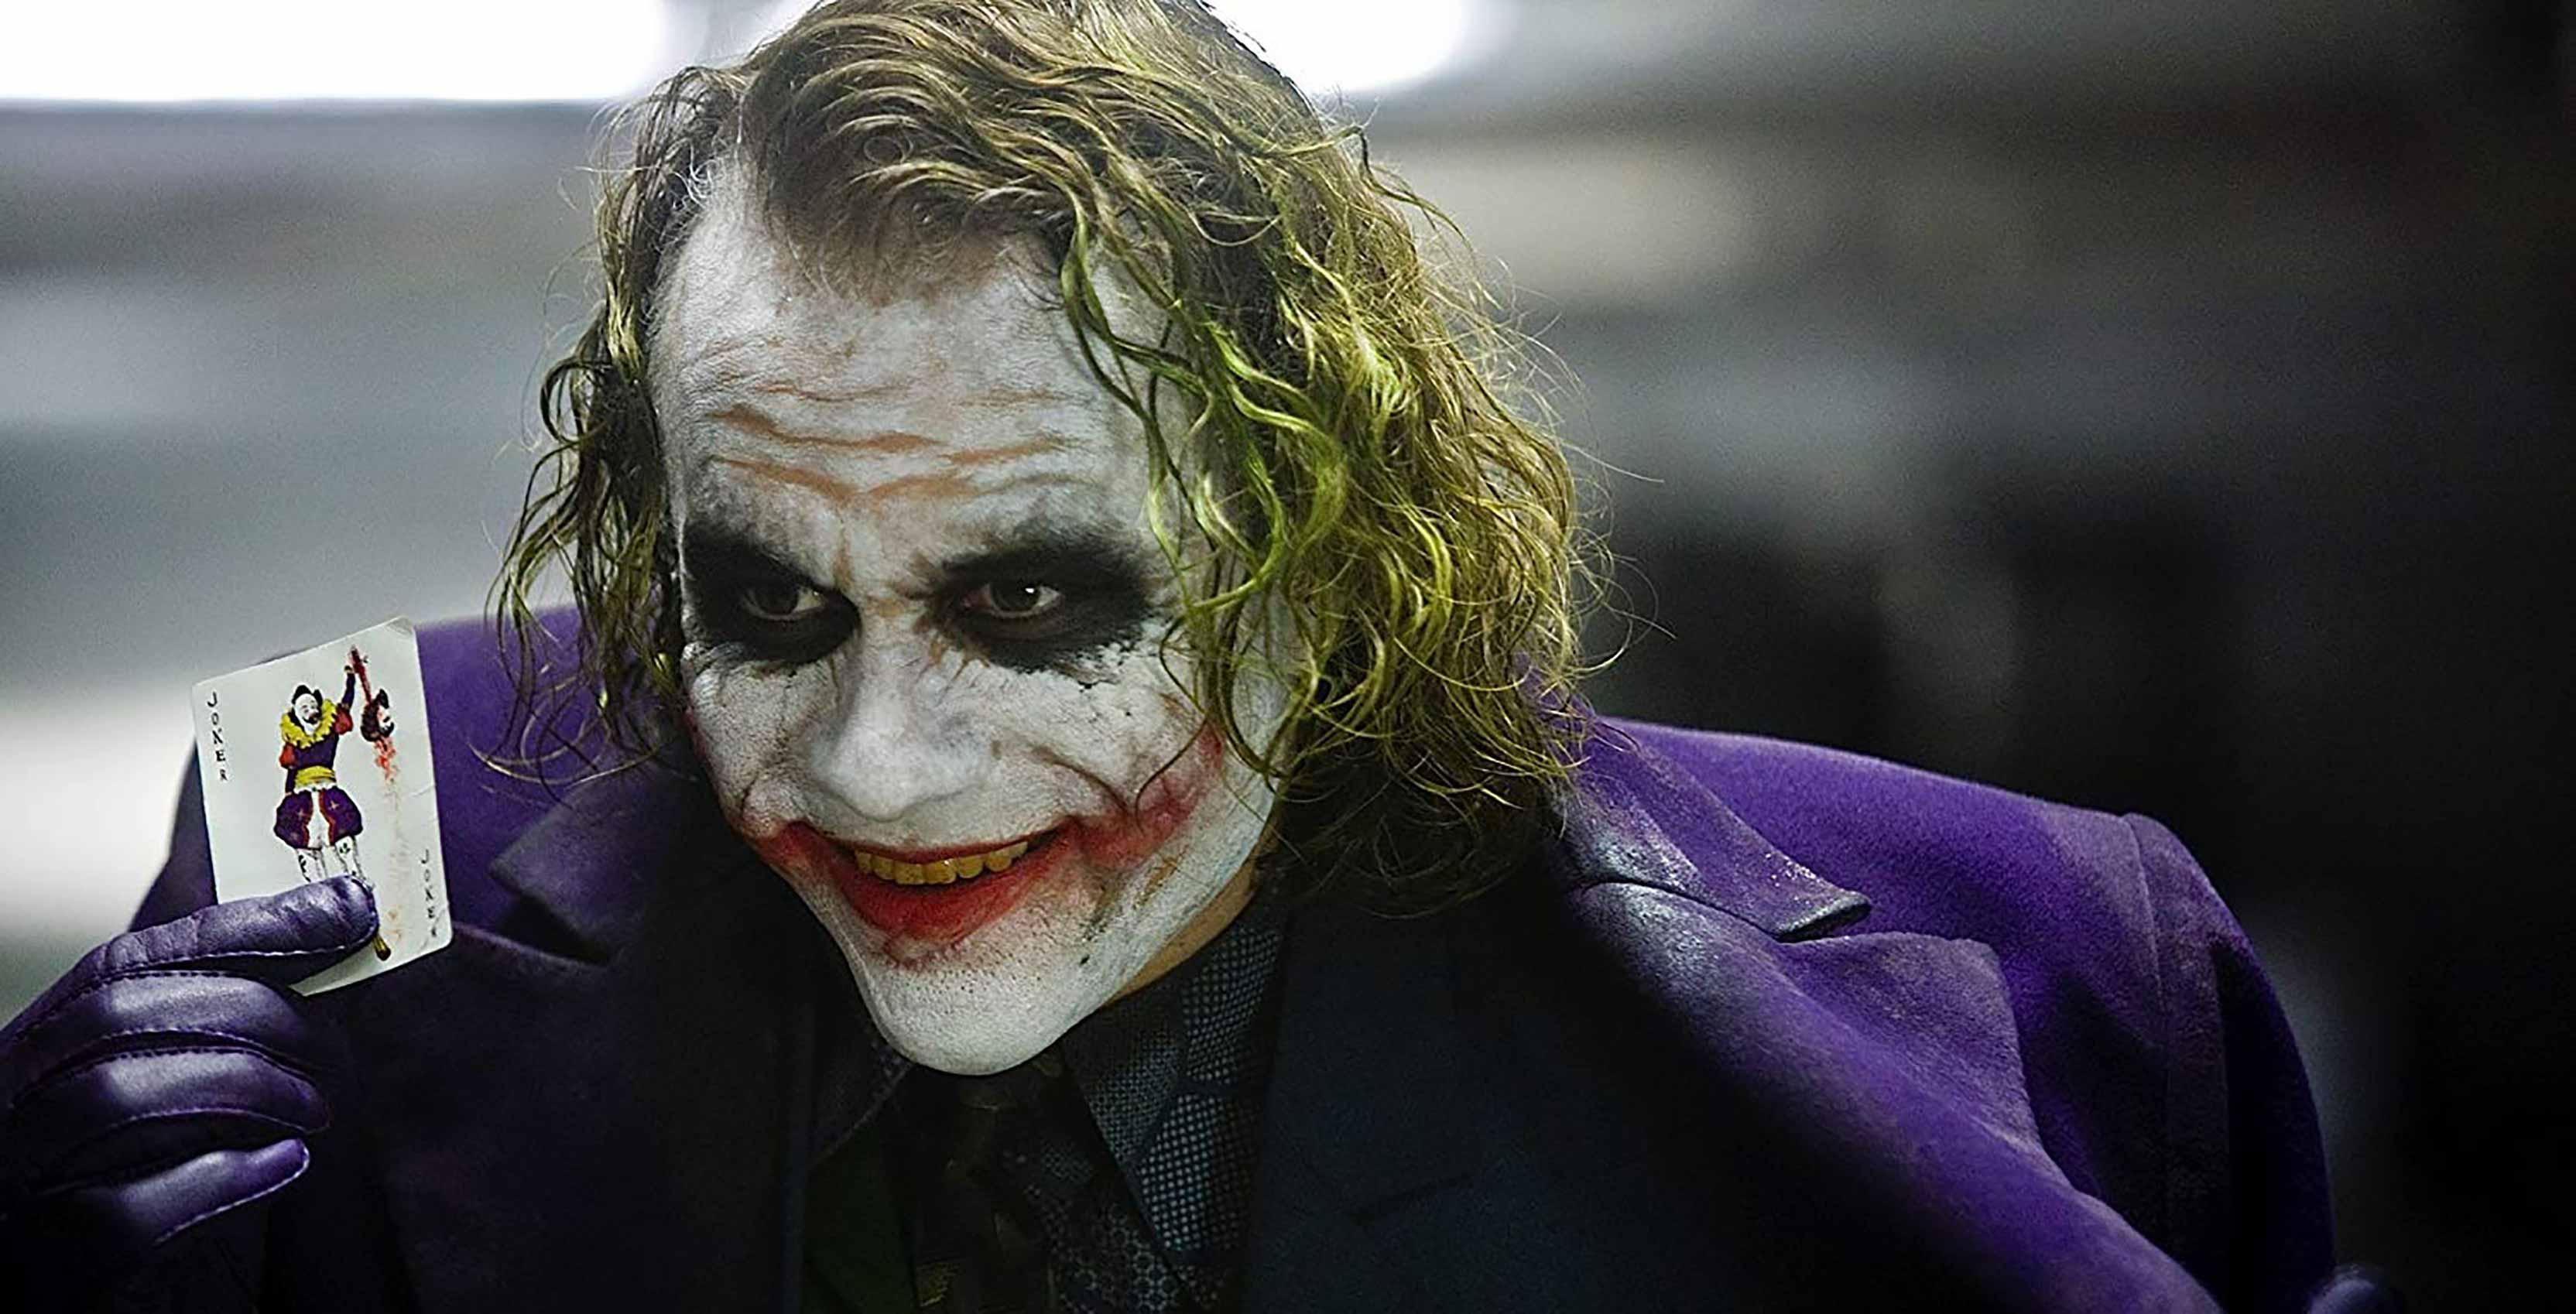 The Dark Knight Heath Ledger as The Joker